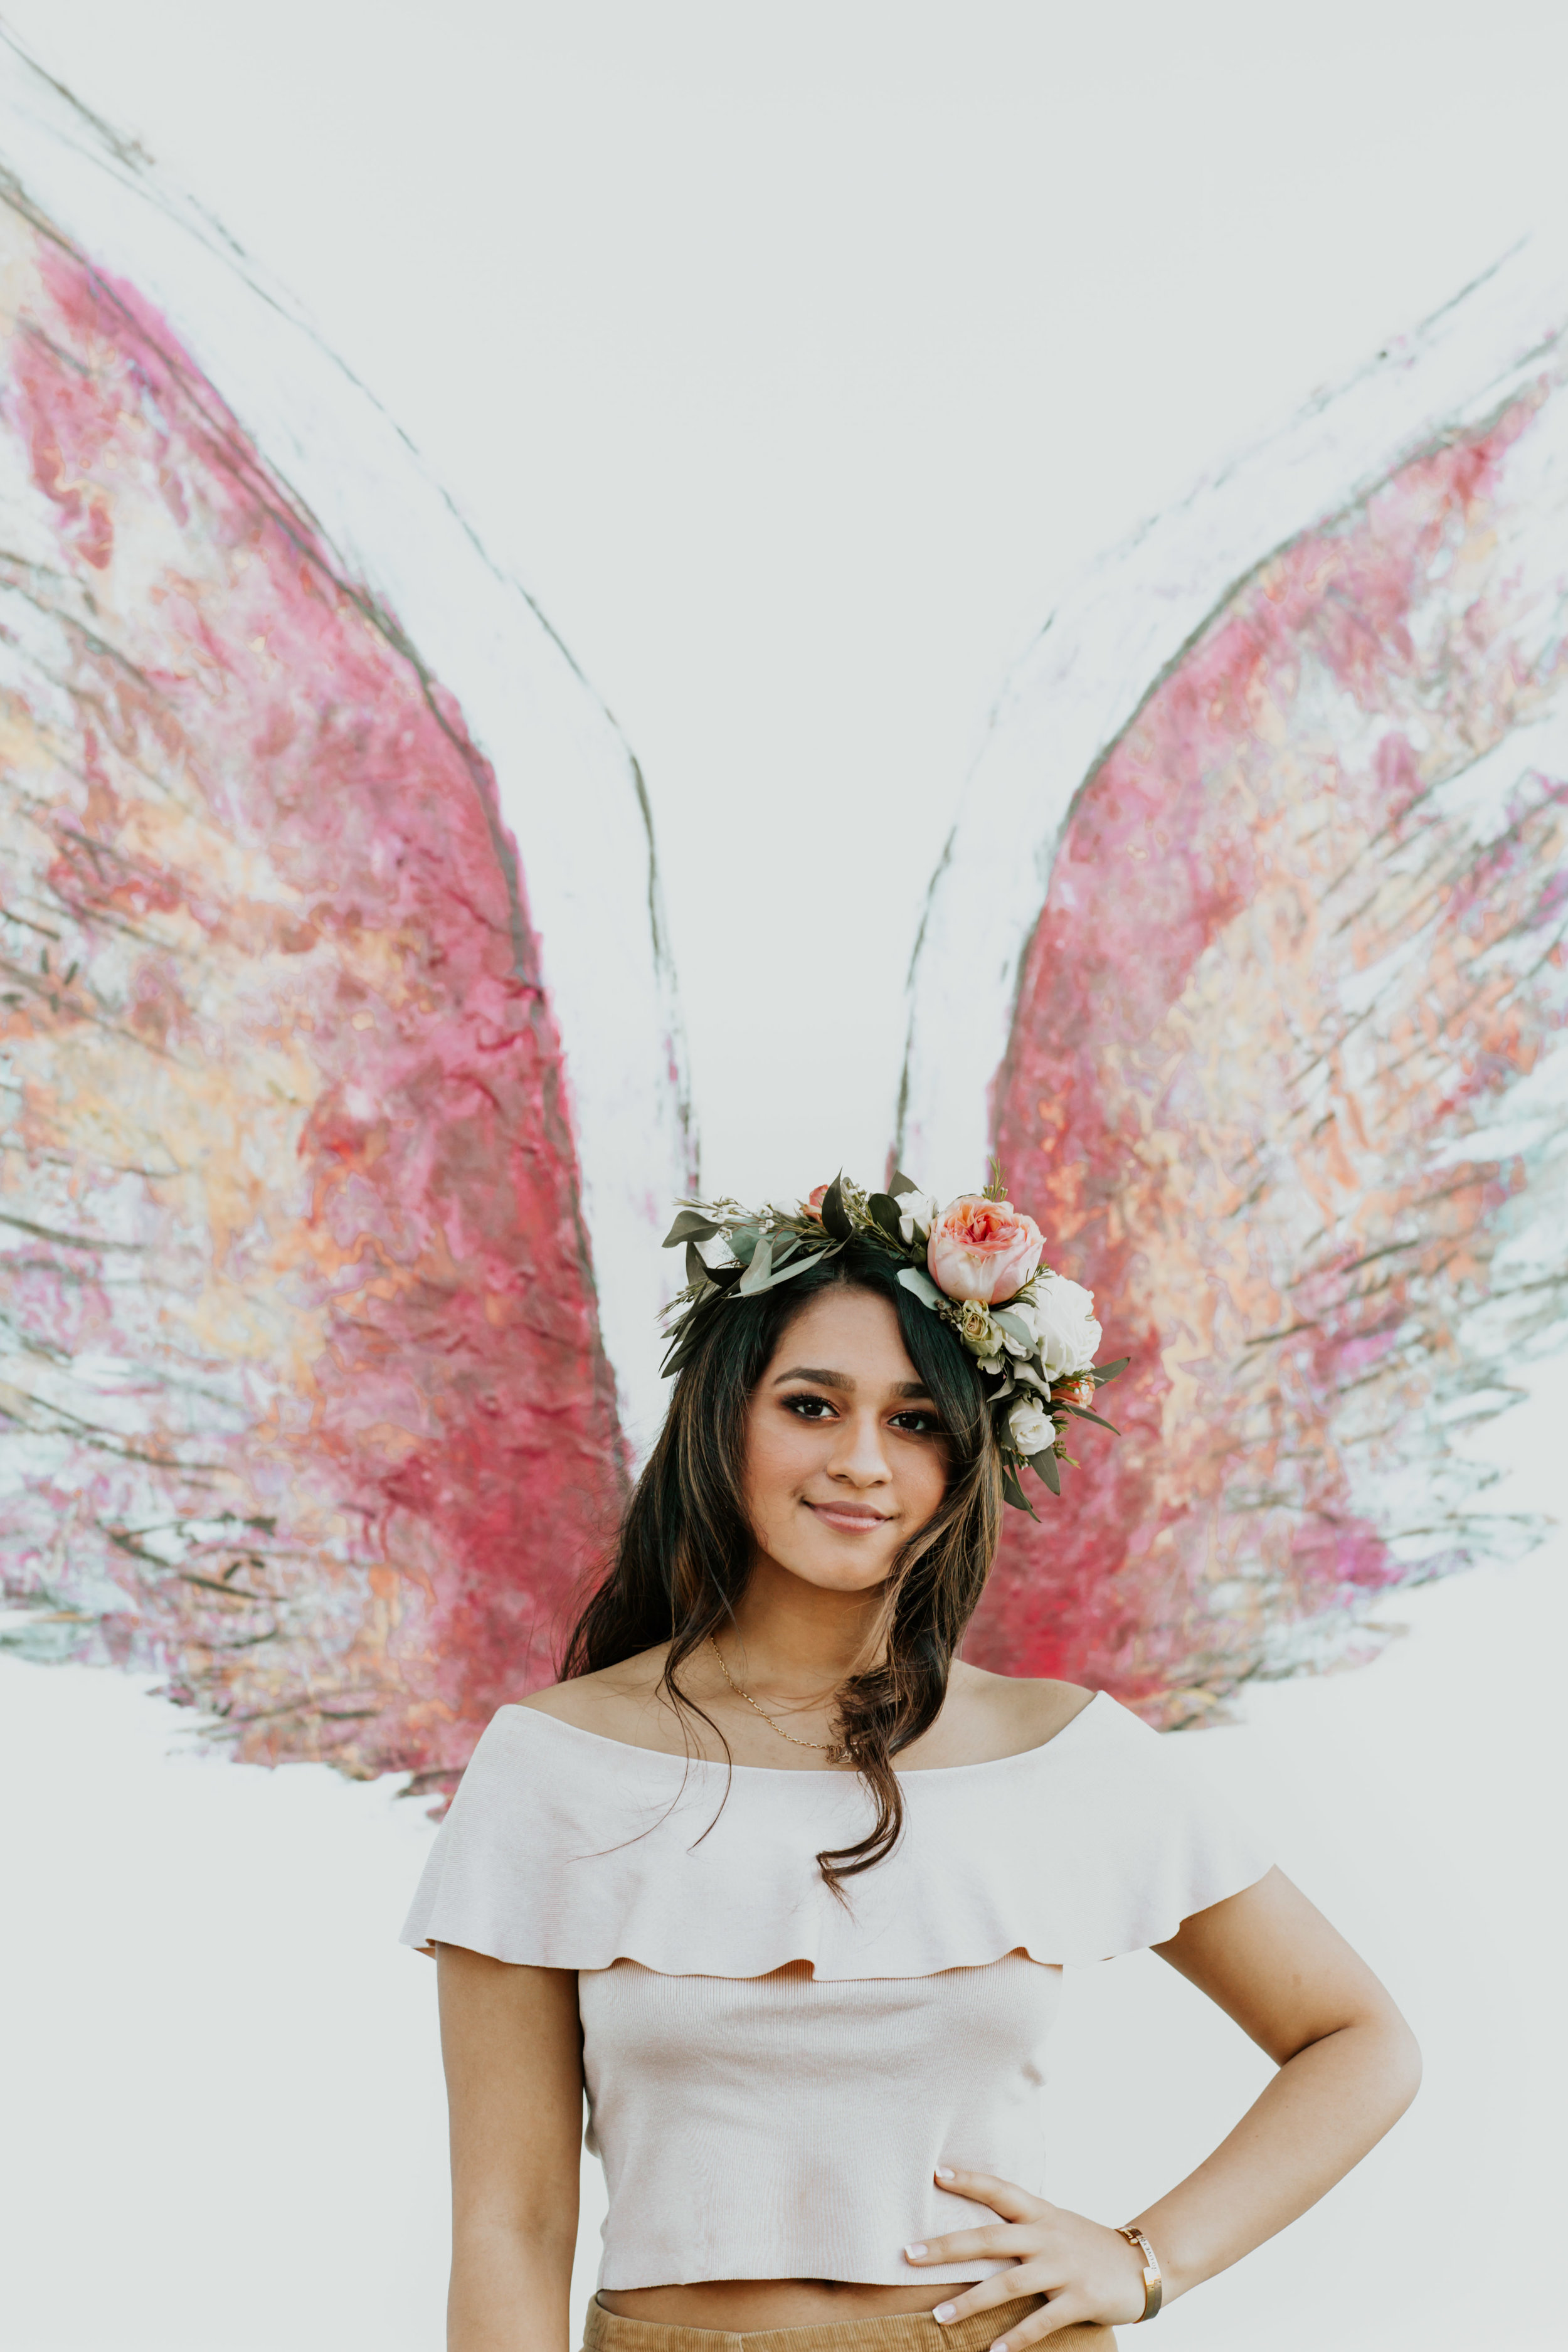 Alyssa | Raghu | Jacq and Jack | bonjour Nona | Lake Nona Social | Tavistock | The global angel wings project | Colette Miller | Vanessa Boy (13 of 15).jpg